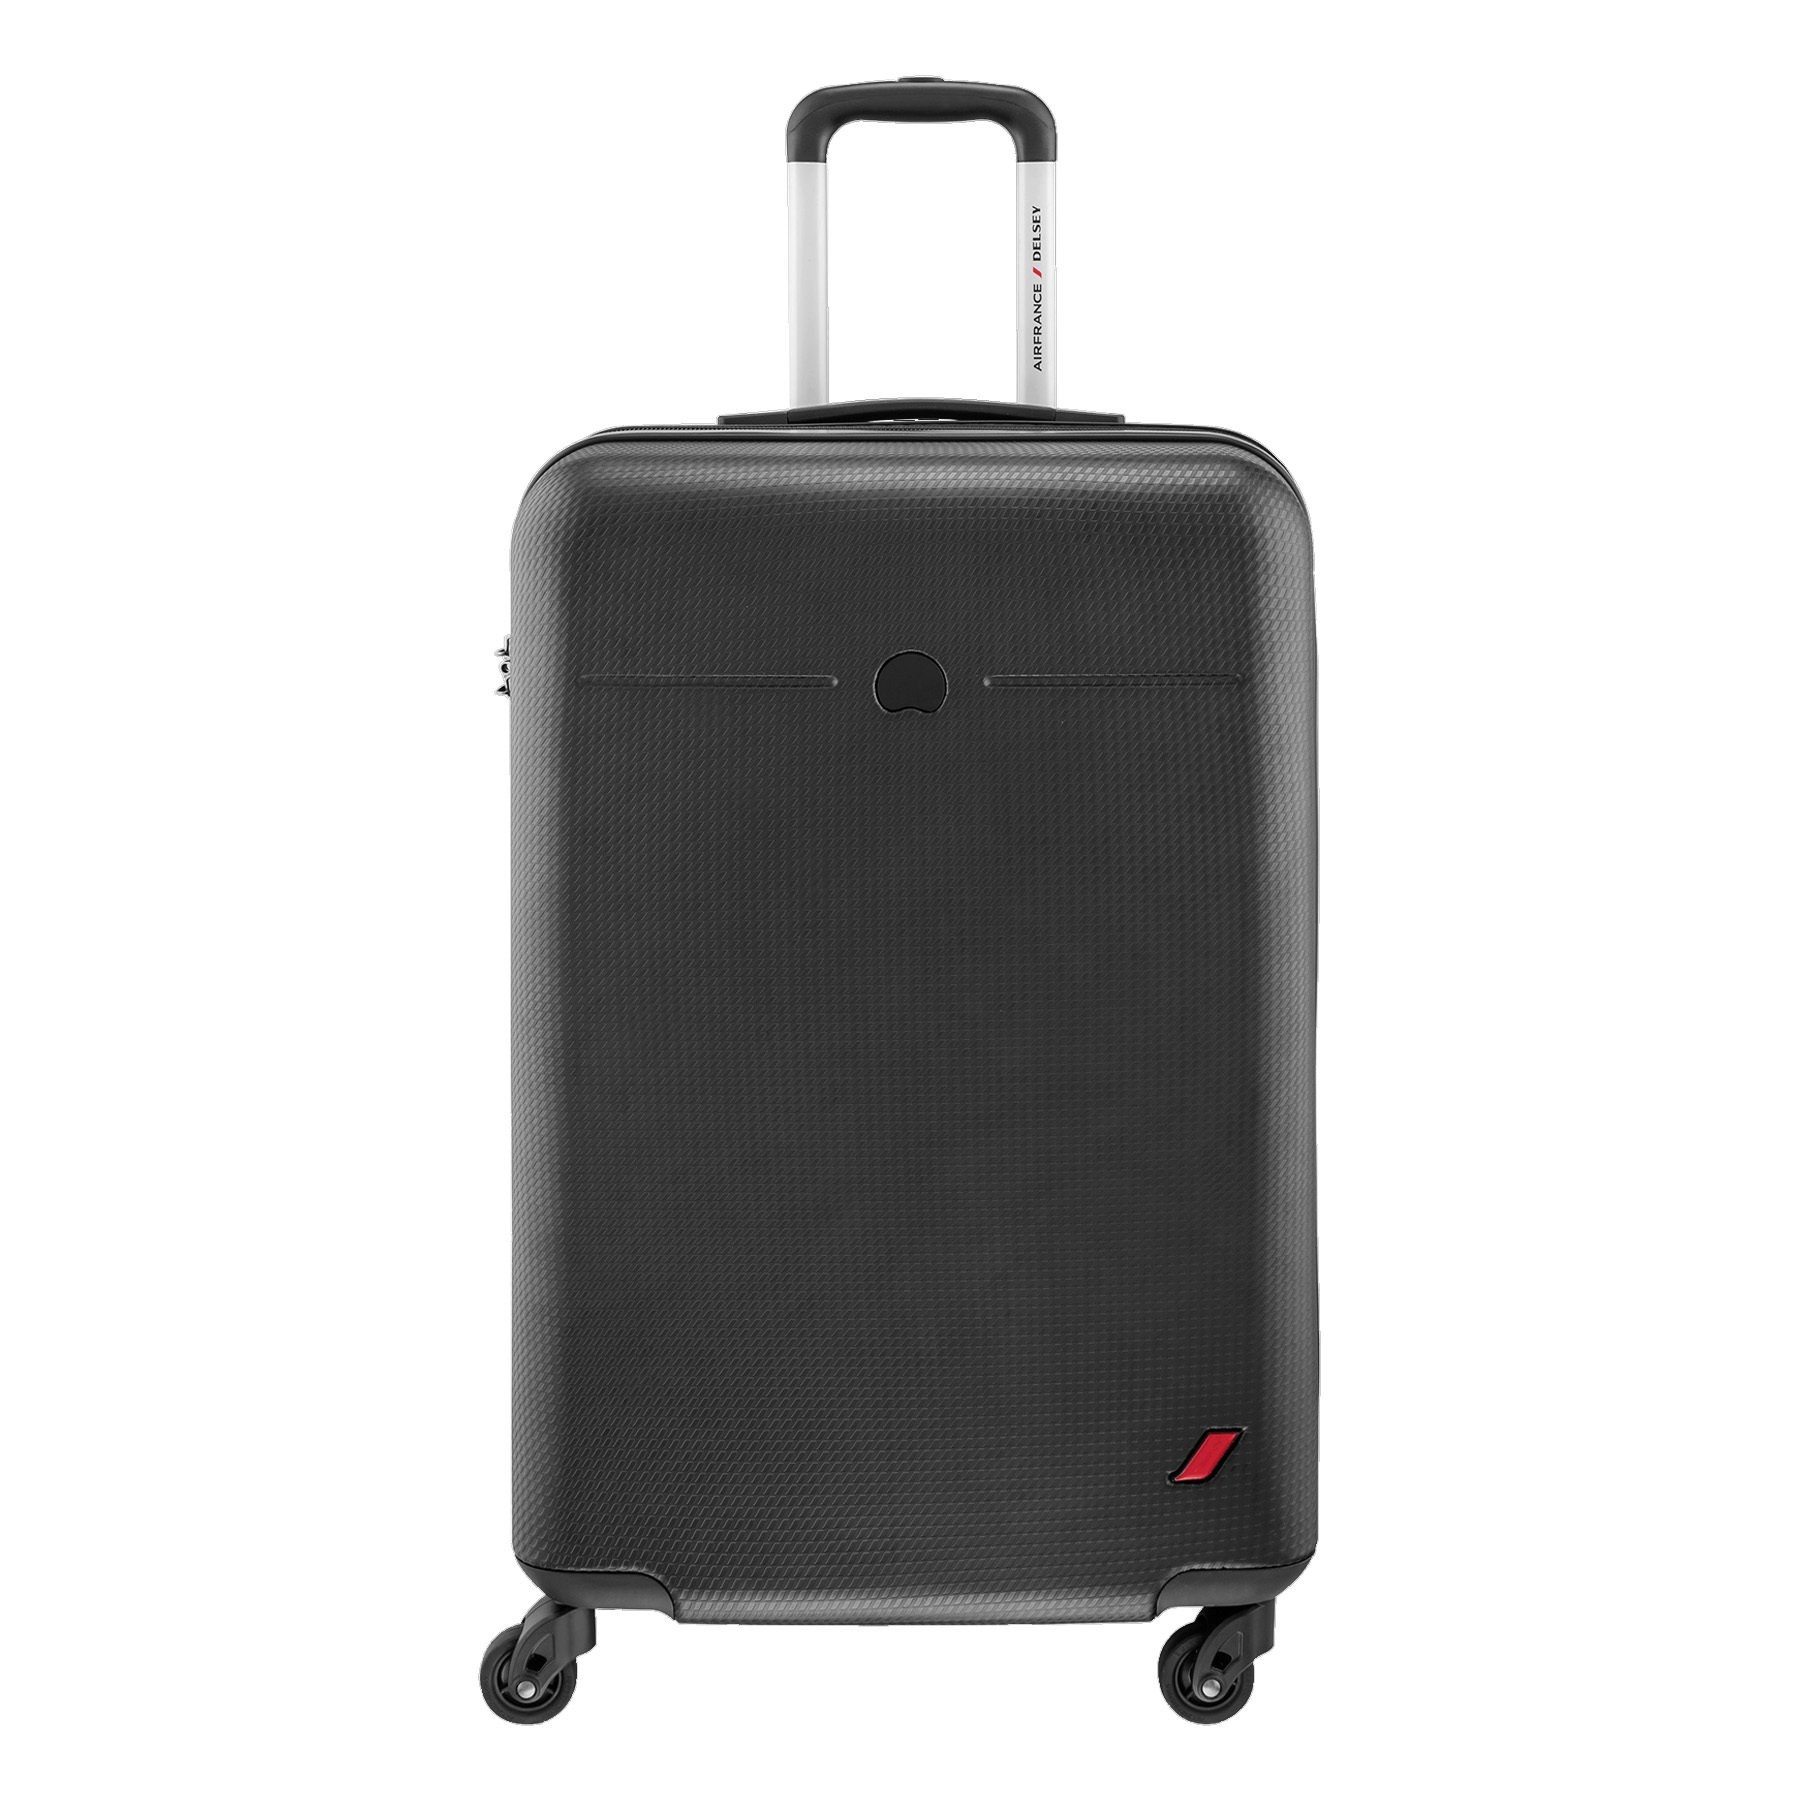 Delsey Envol Koper Hard Case 55 cm - Hitam